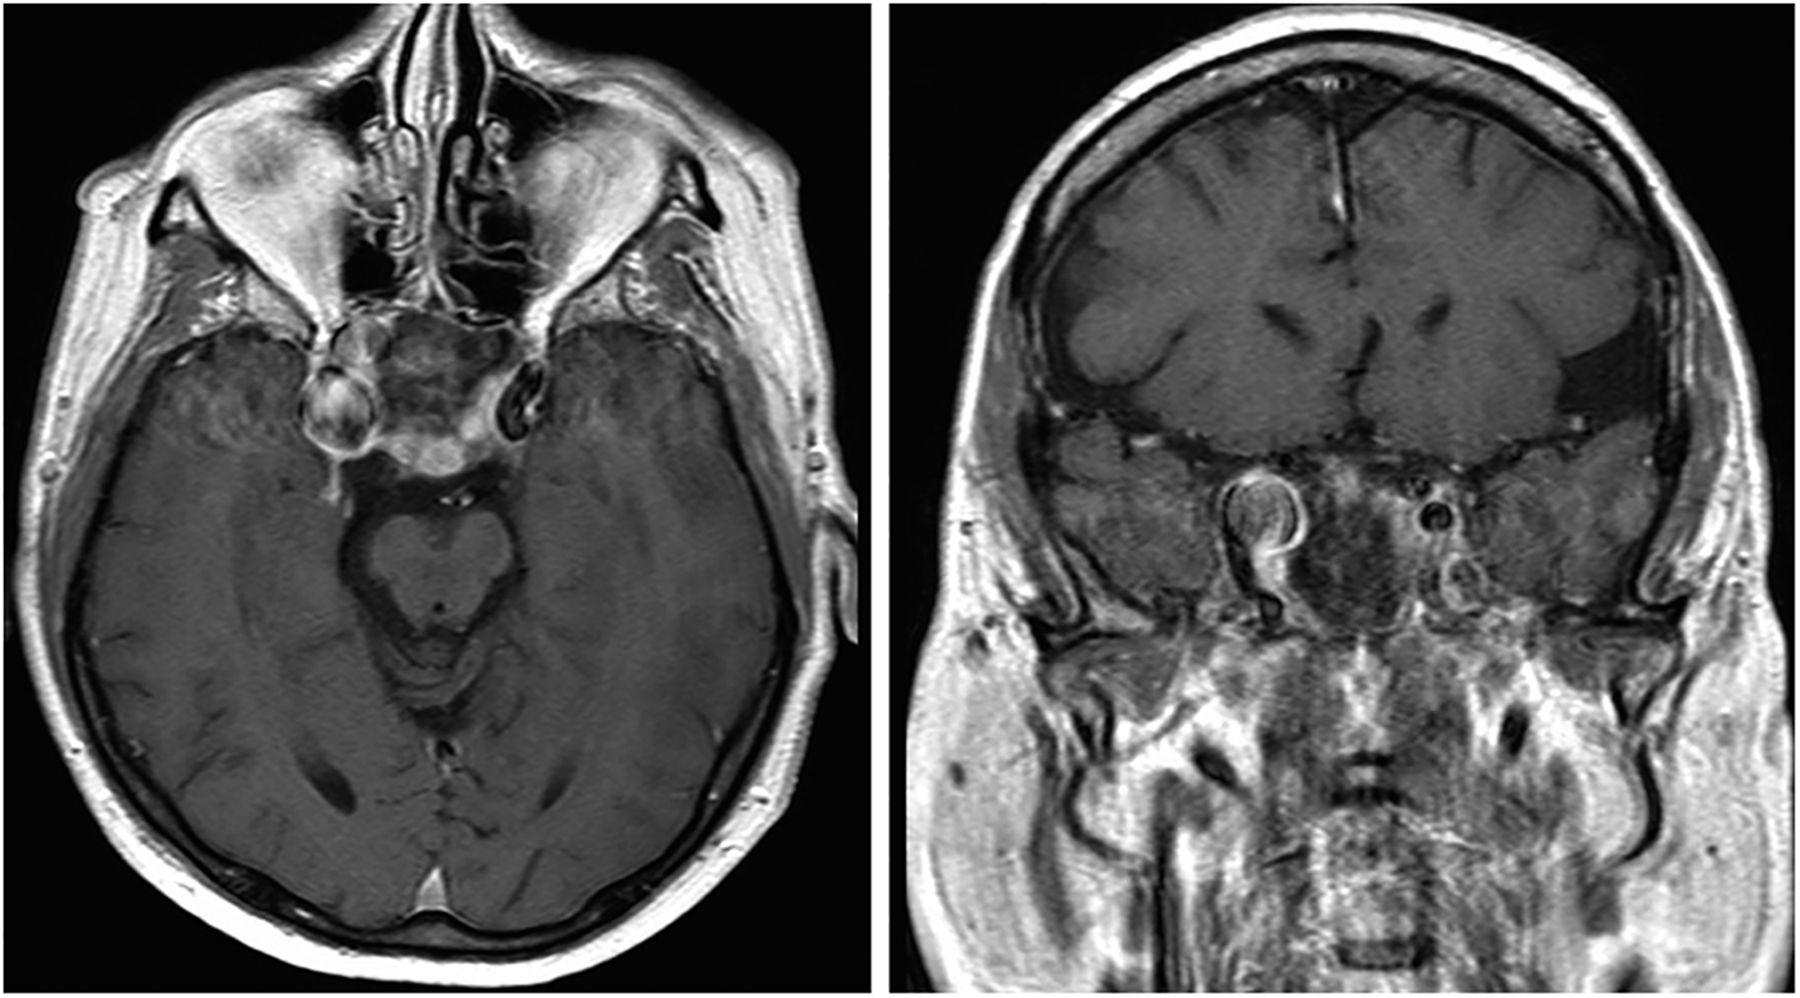 spontaneous subarachnoid hemorrhage due to ruptured